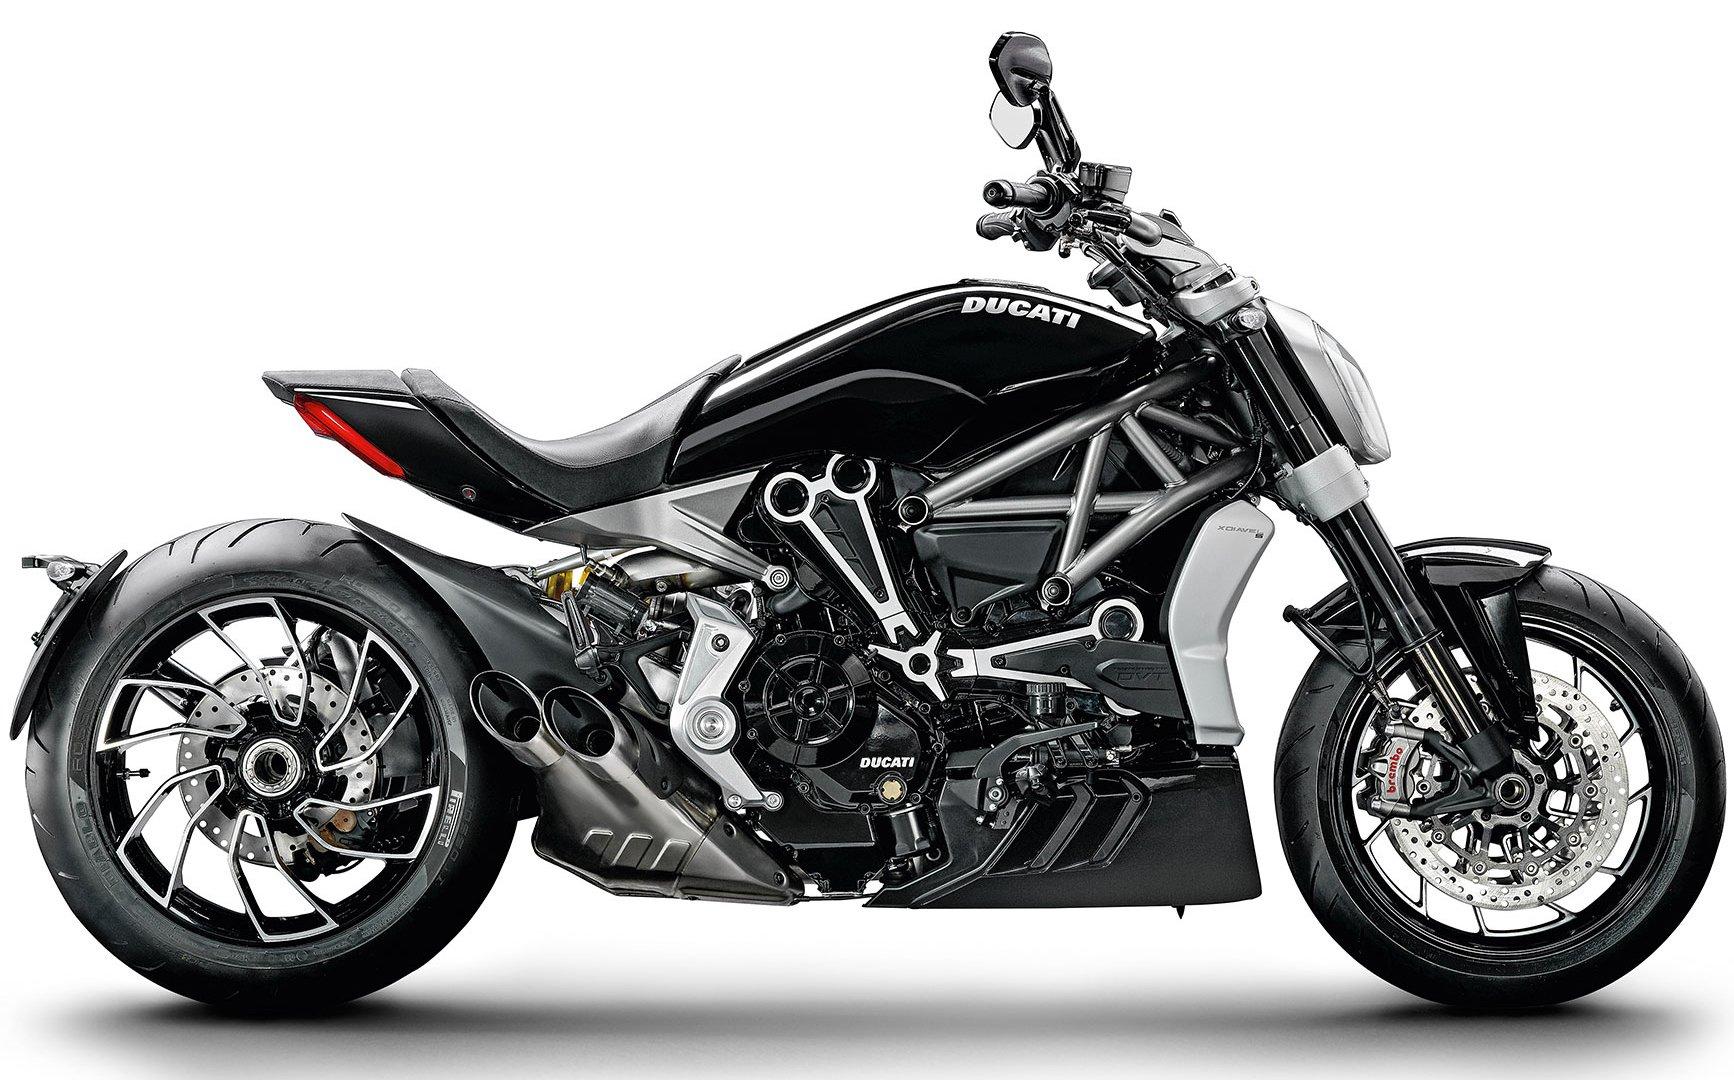 Мотоцикл DUCATI XDiavel S - Thrilling Black (2019)